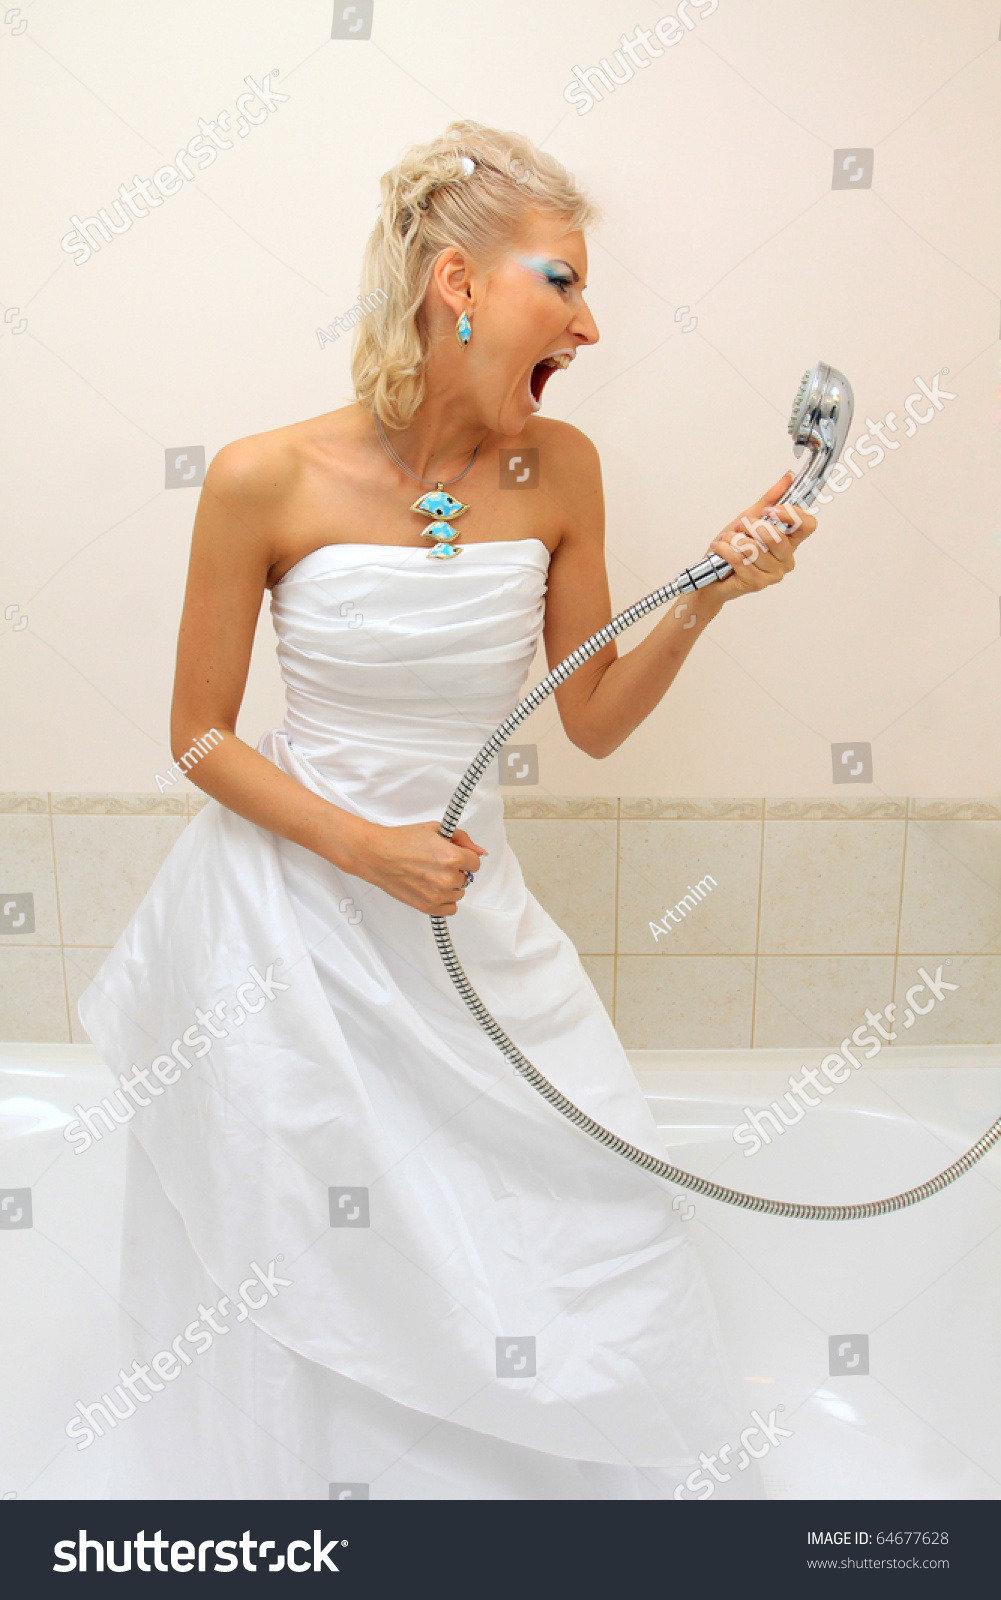 Fashion model wedding dress cries bathroom stock photo for Bathroom dress